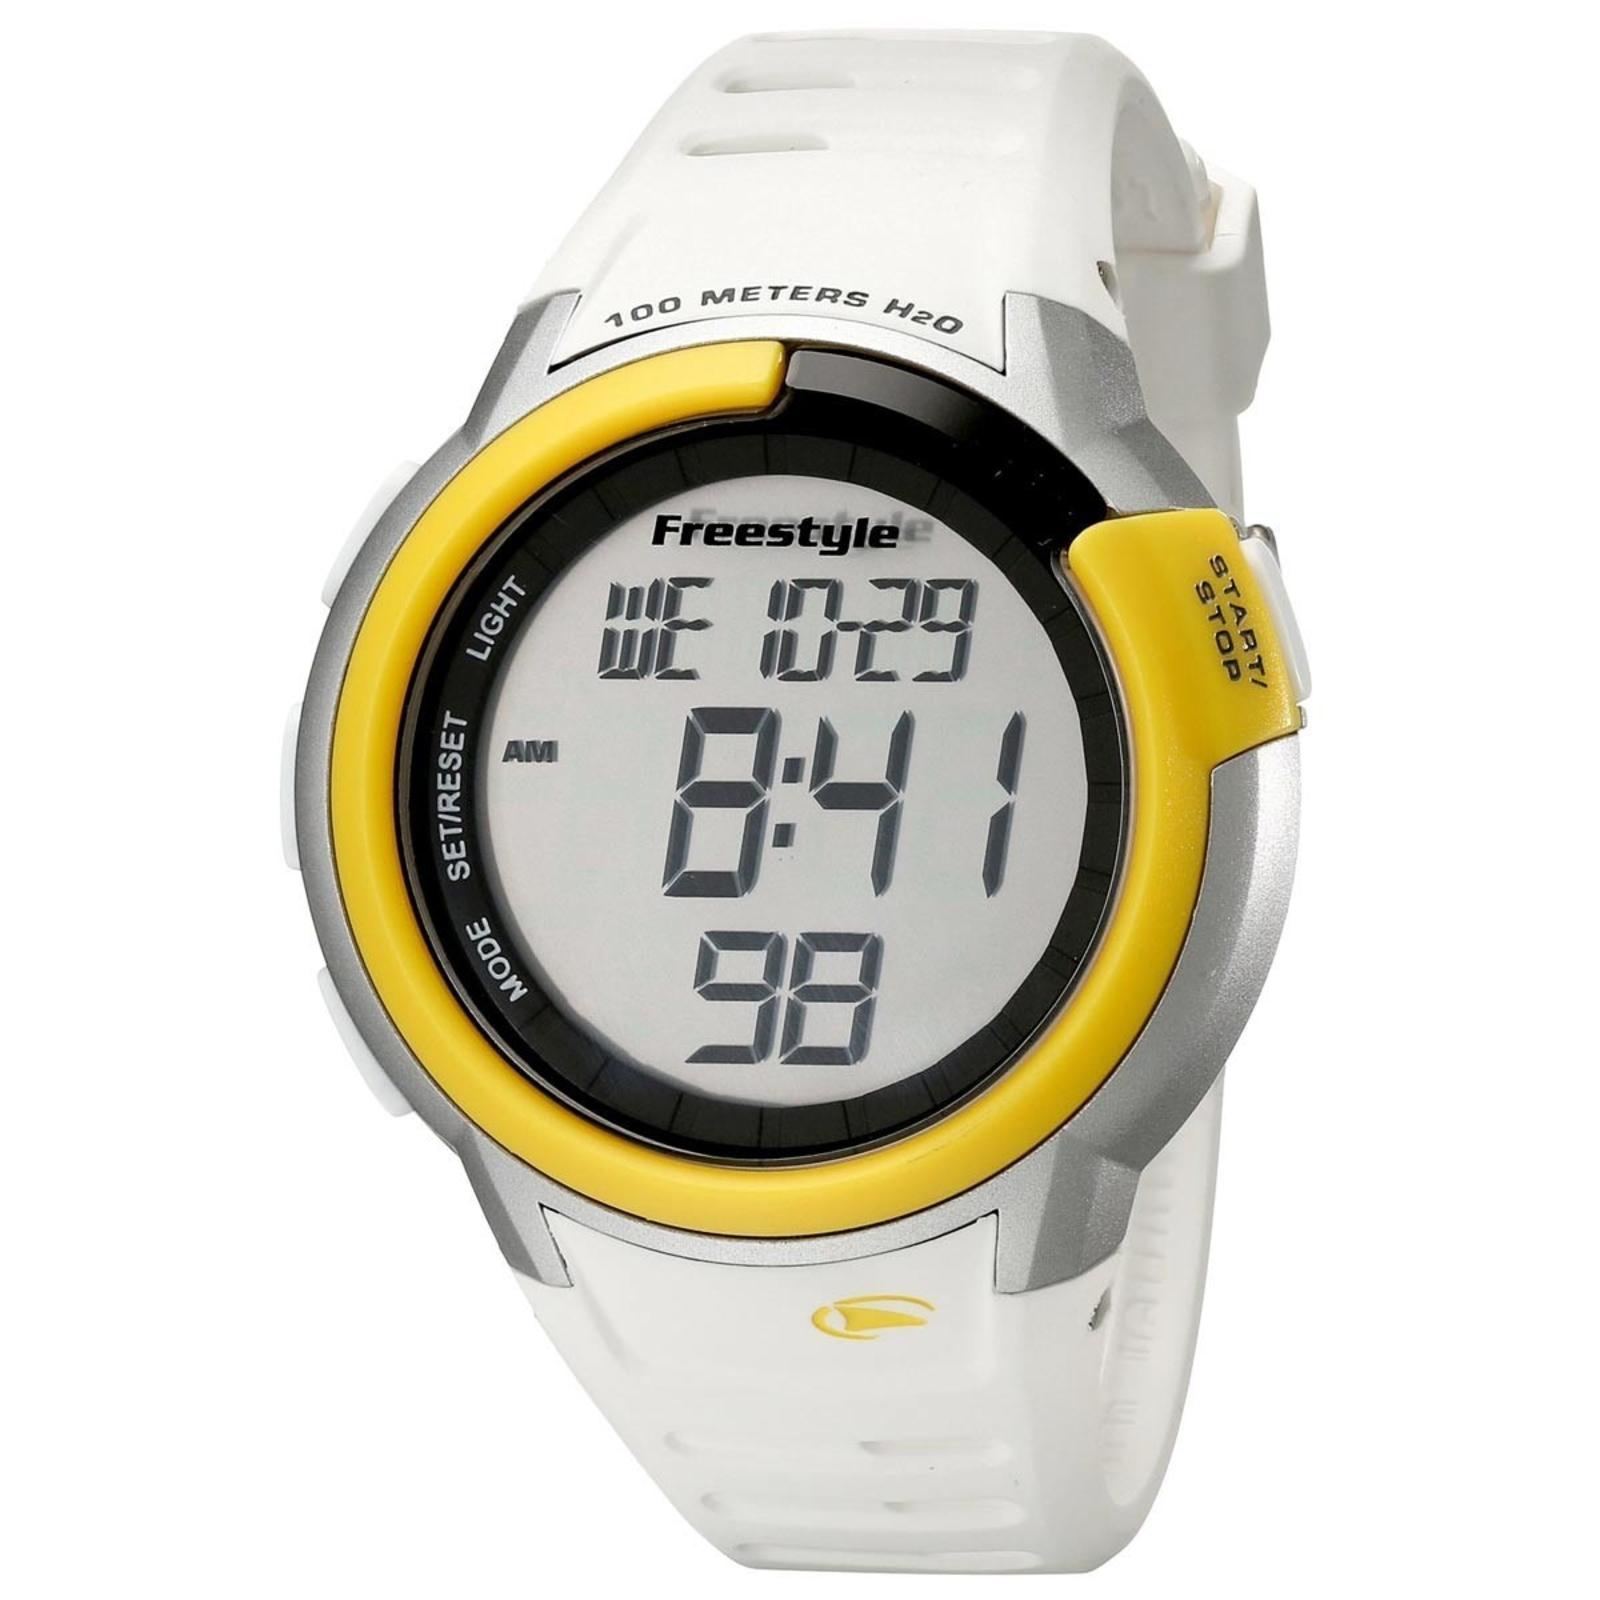 28b09e49e73 Relógio Freestyle Shark Mariner - Branco